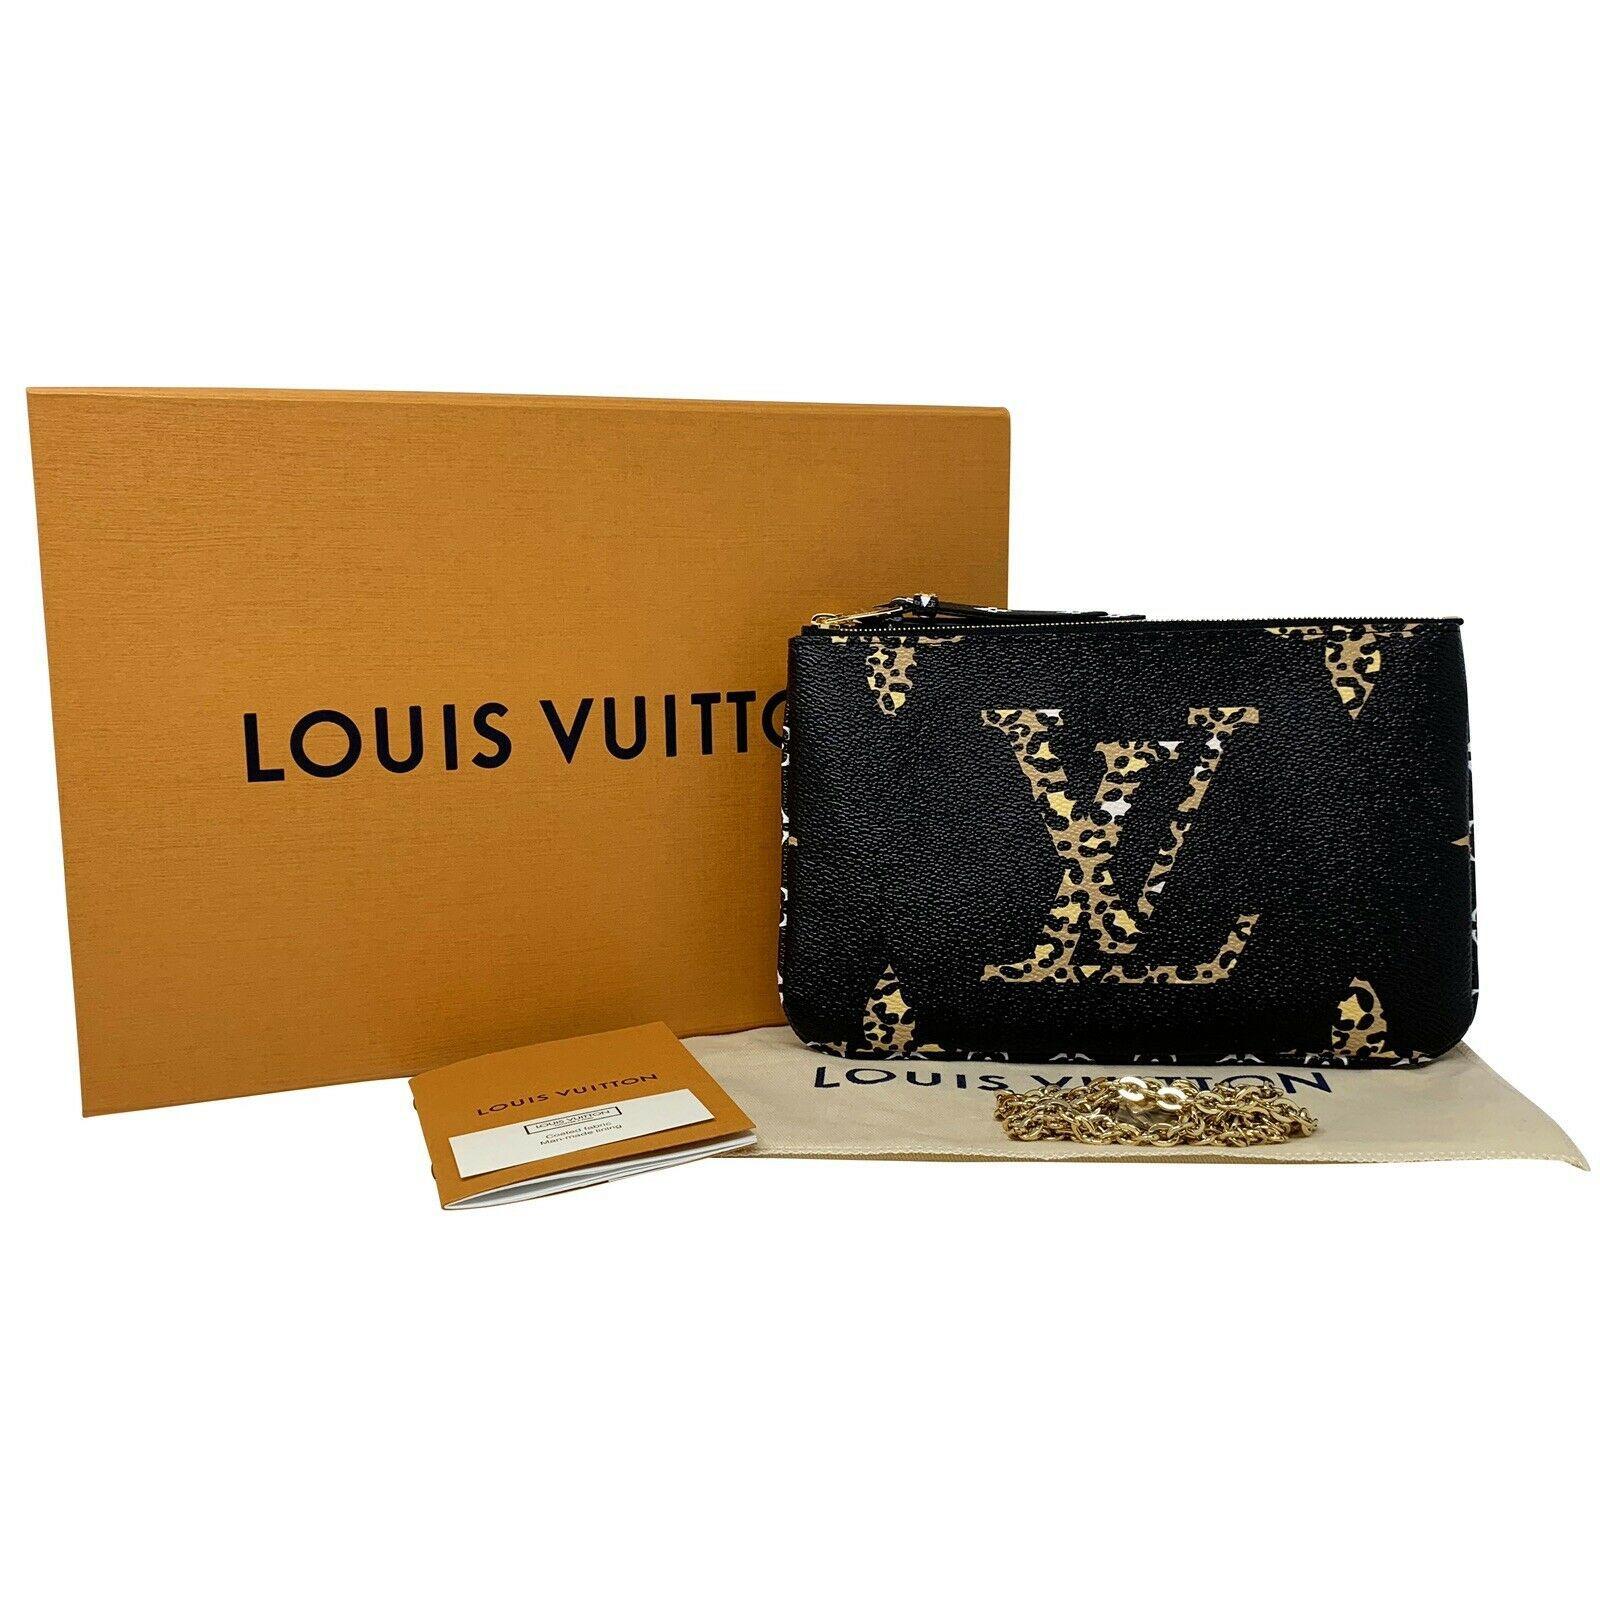 NEW Louis Vuitton Pochette Double Zip Black Jungle Giant Monogram Crossbody Bag image 12